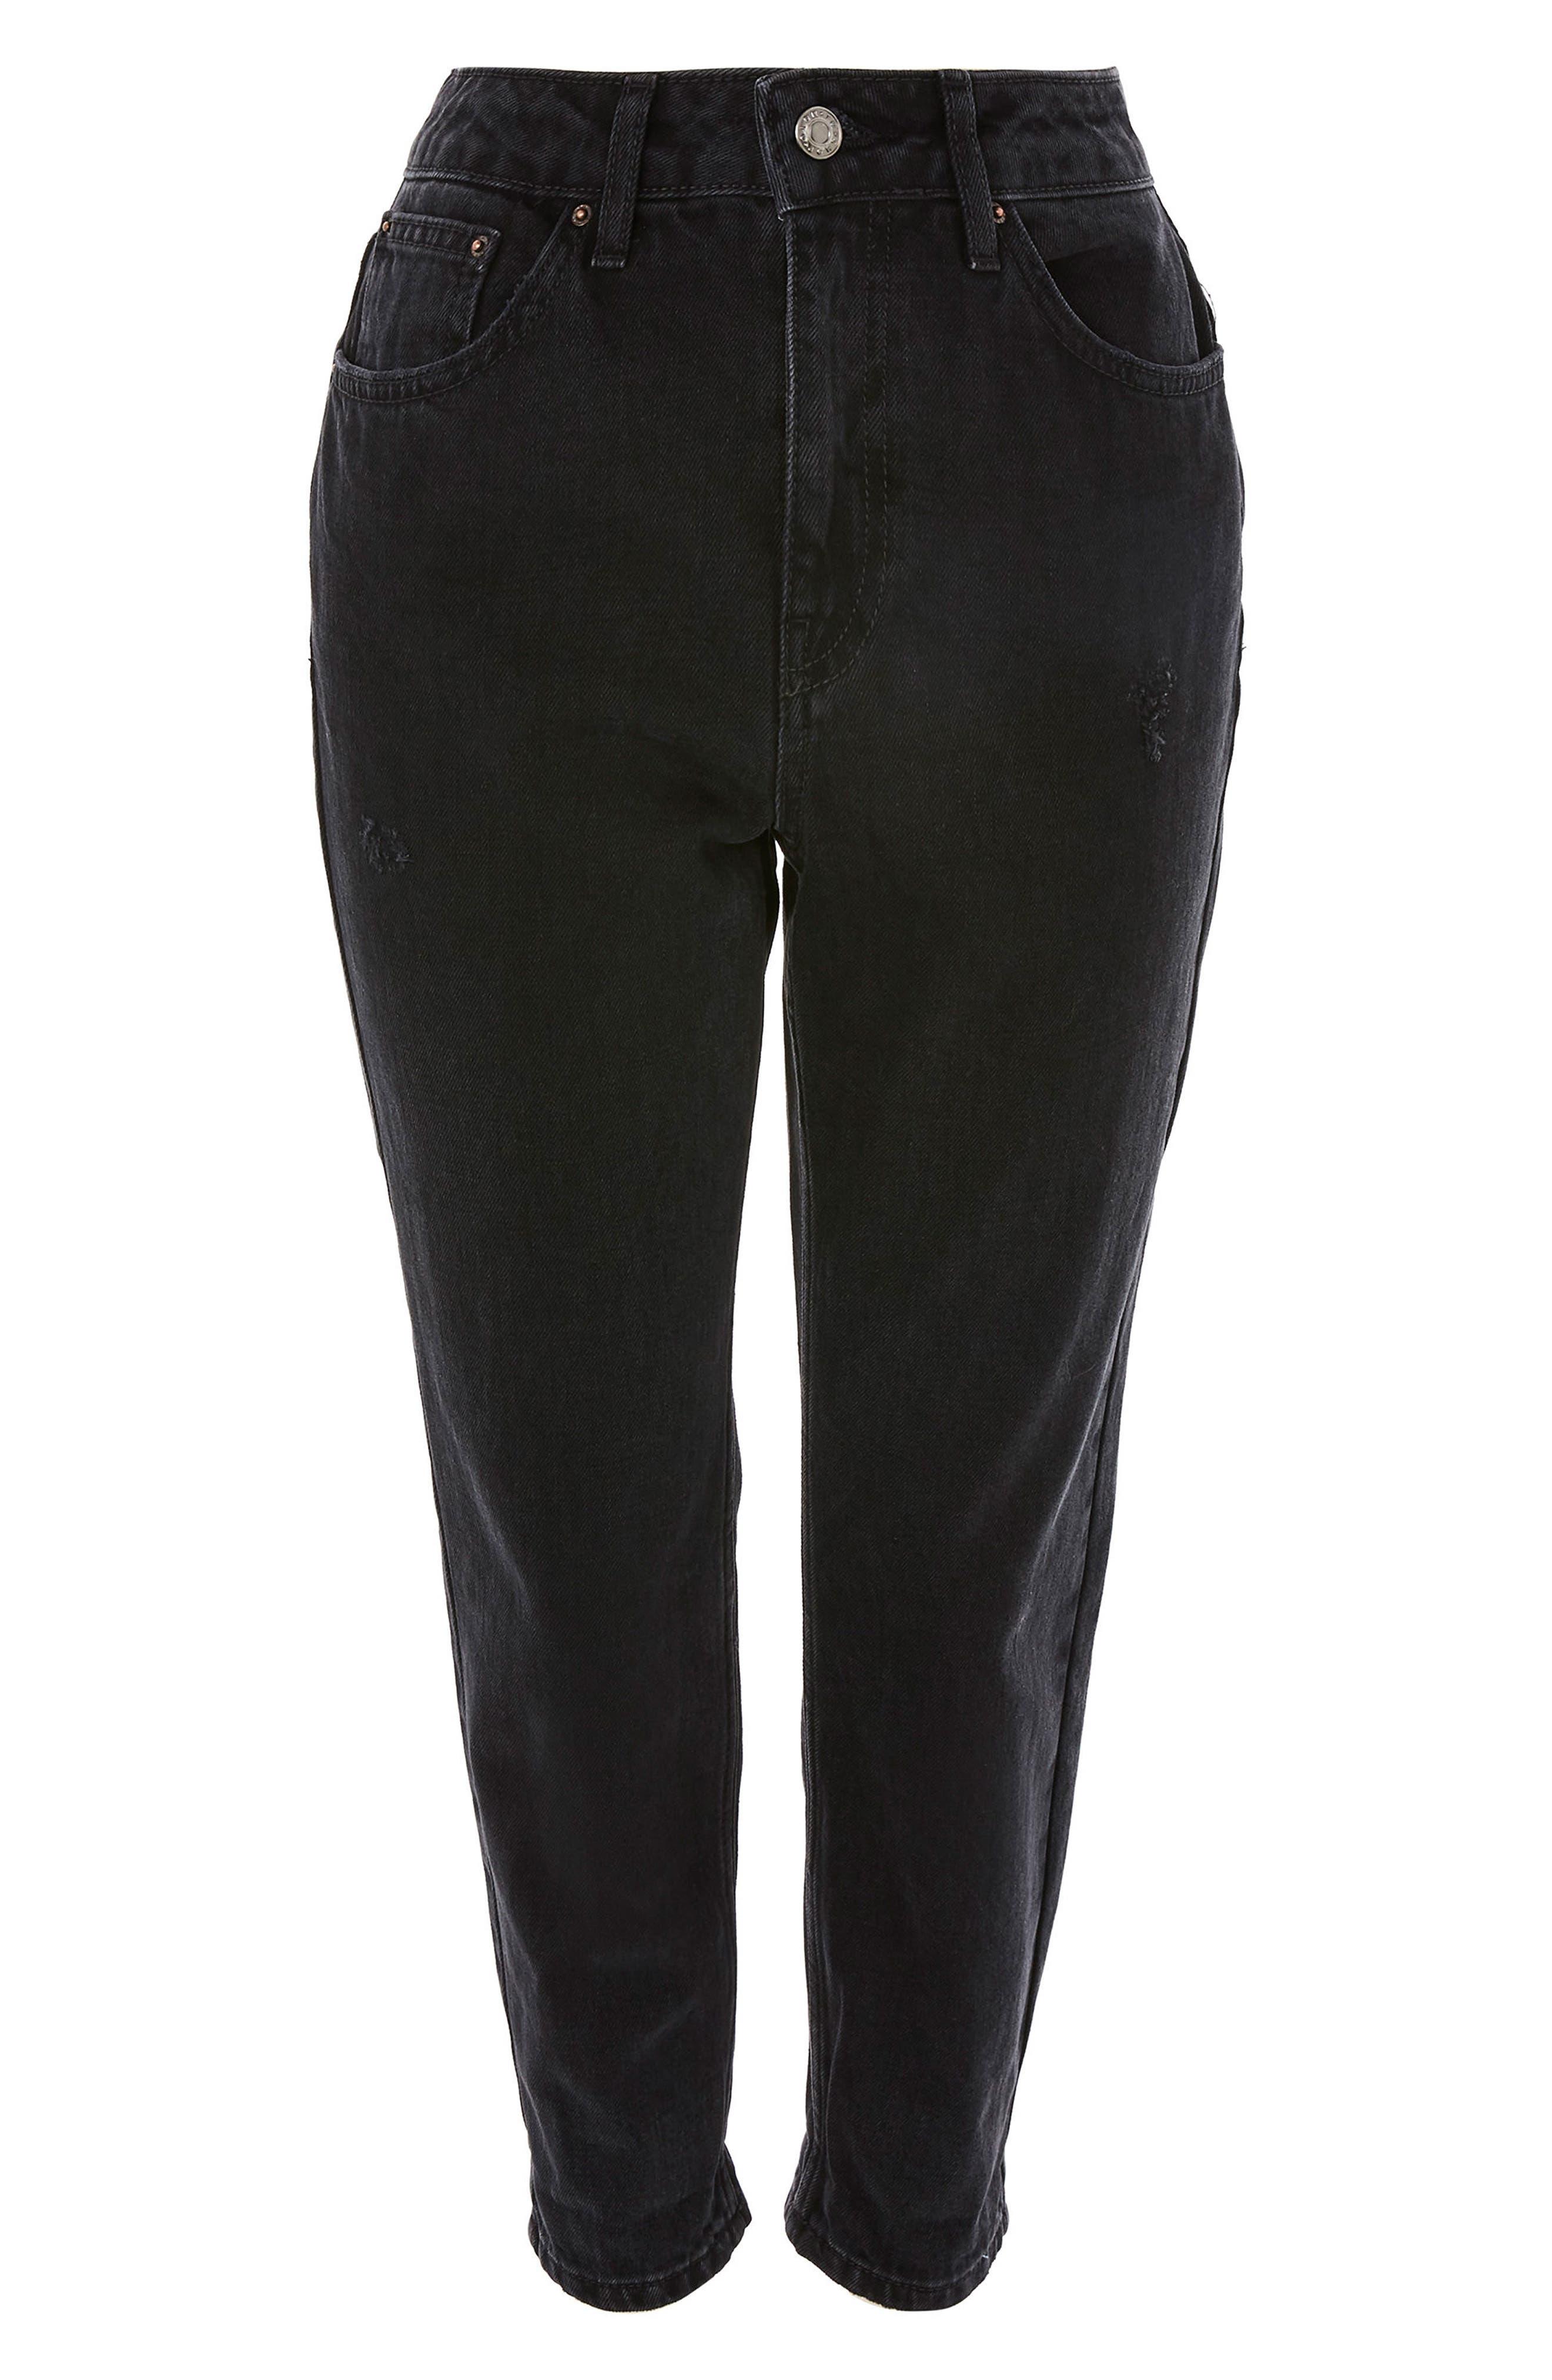 Black Mom Jeans,                             Alternate thumbnail 3, color,                             BLACK